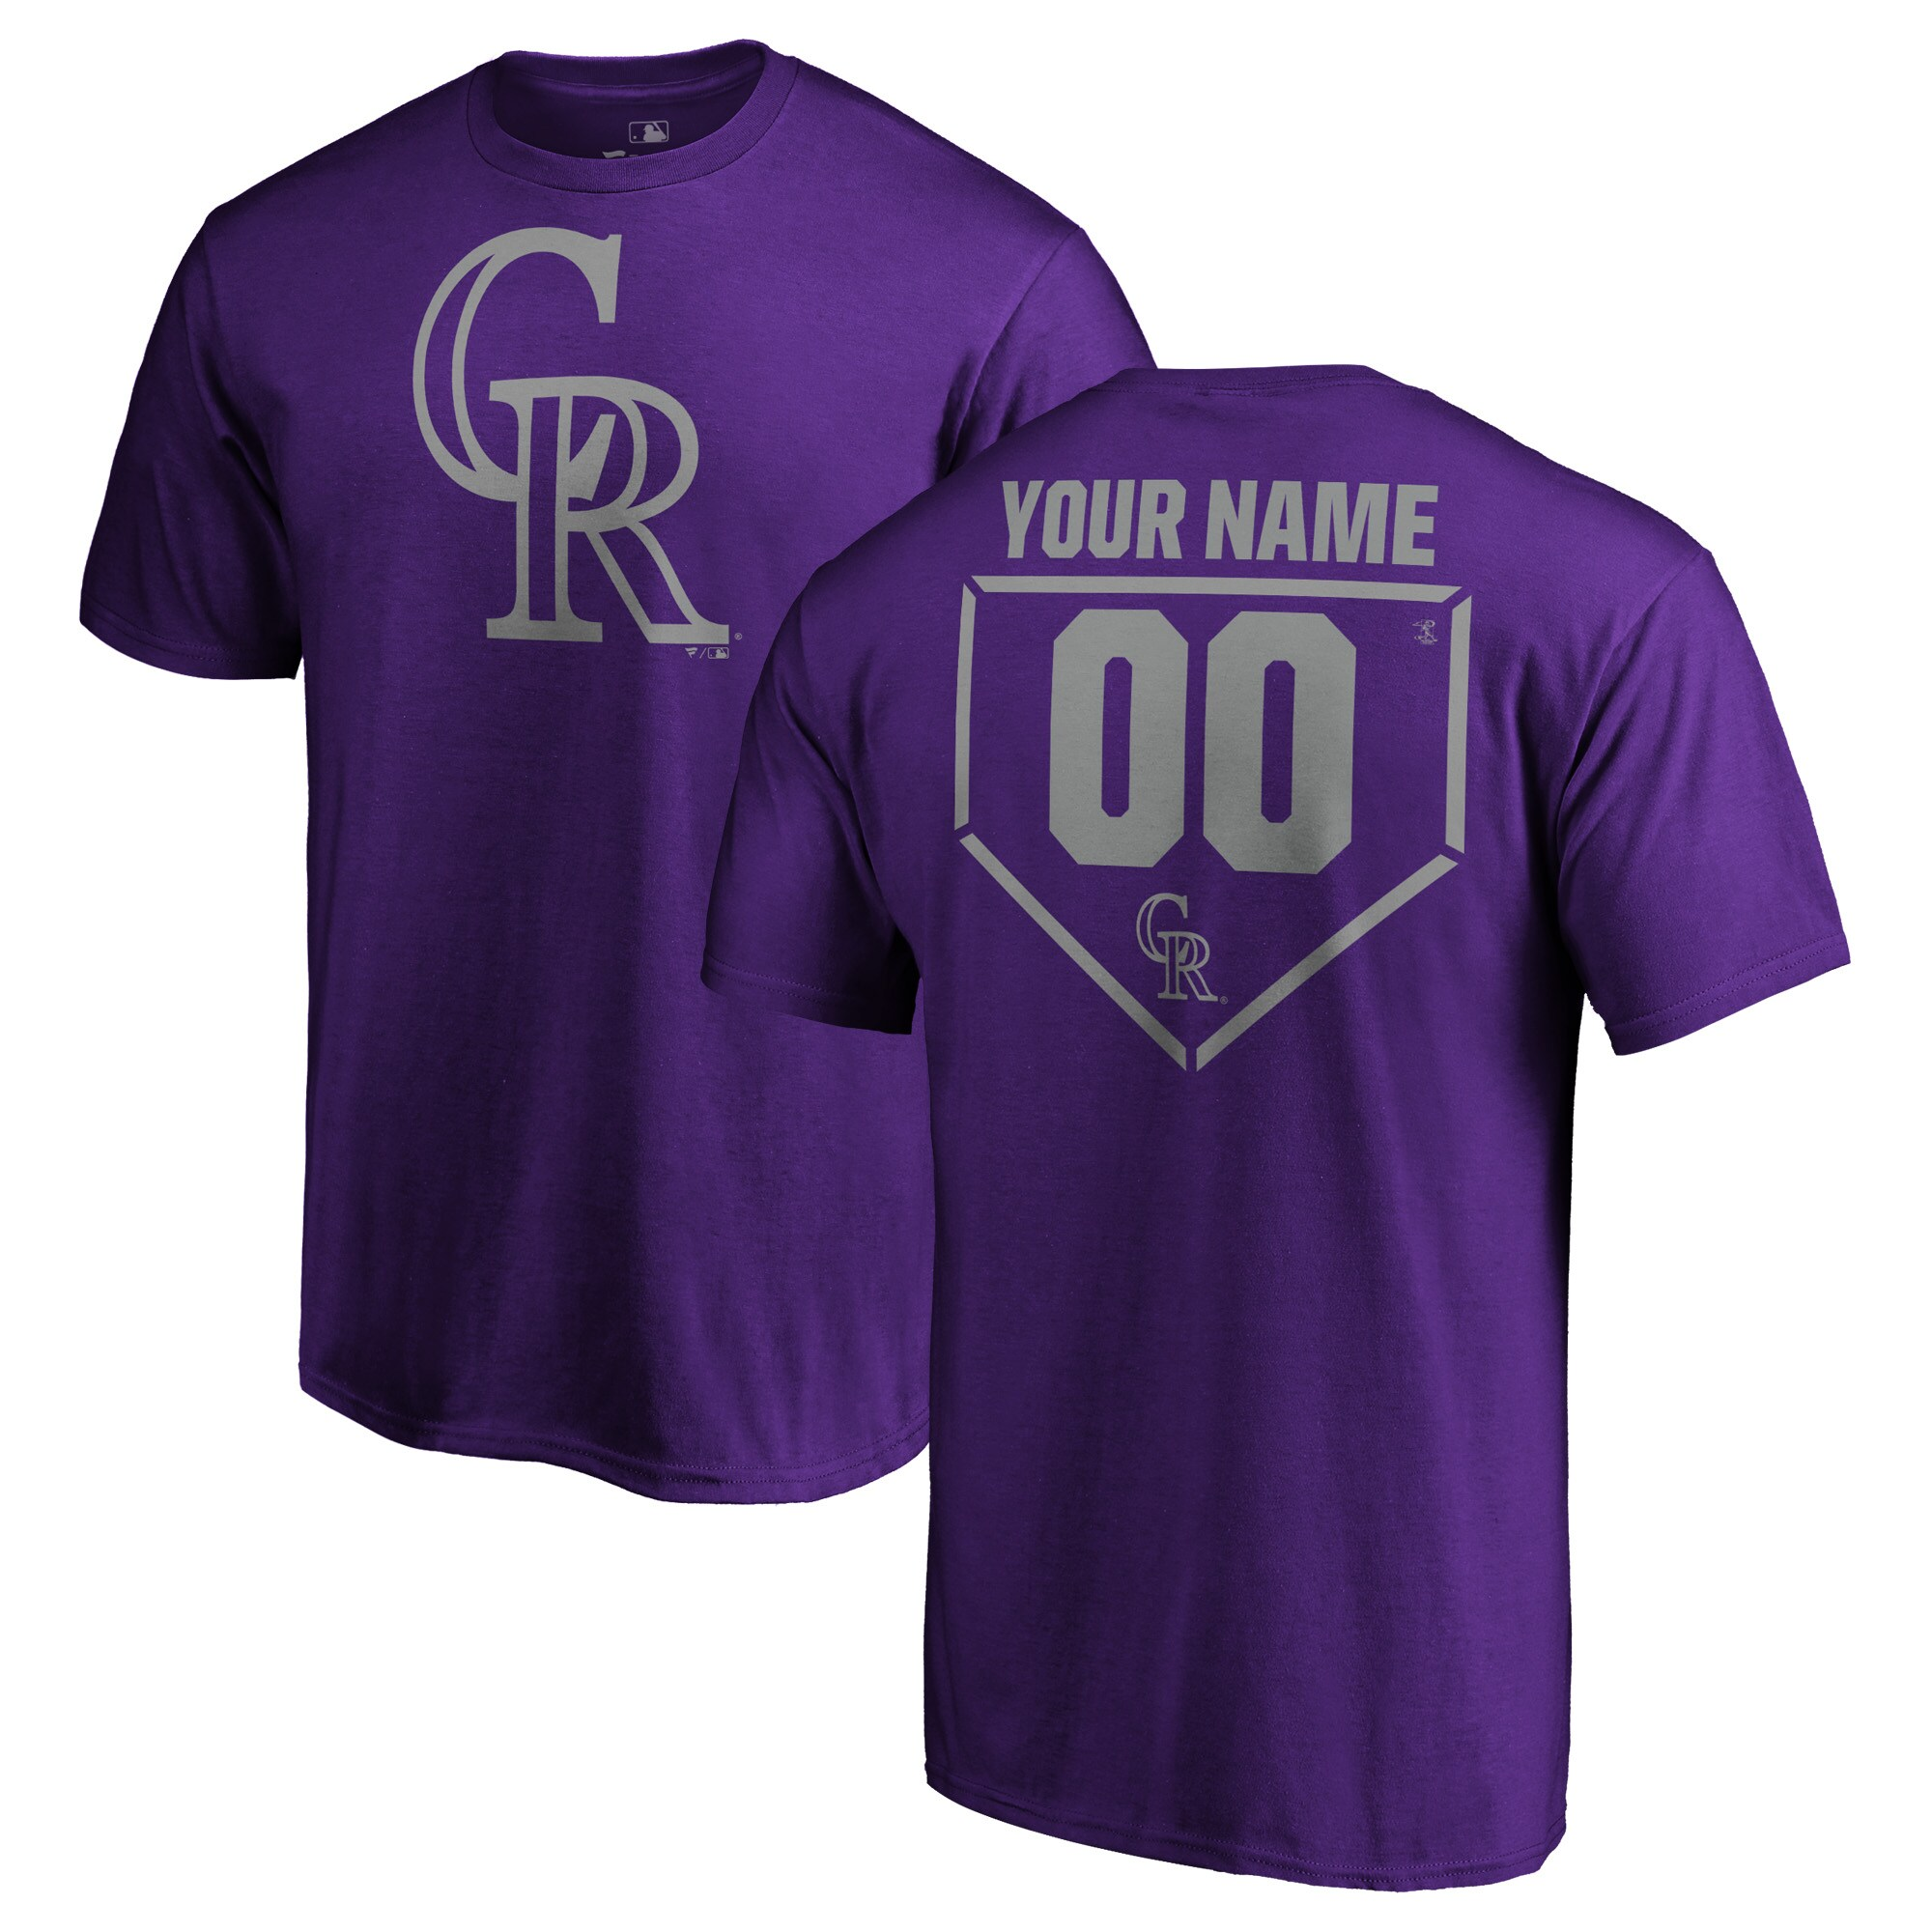 Colorado Rockies Fanatics Branded Personalized RBI T-Shirt - Purple